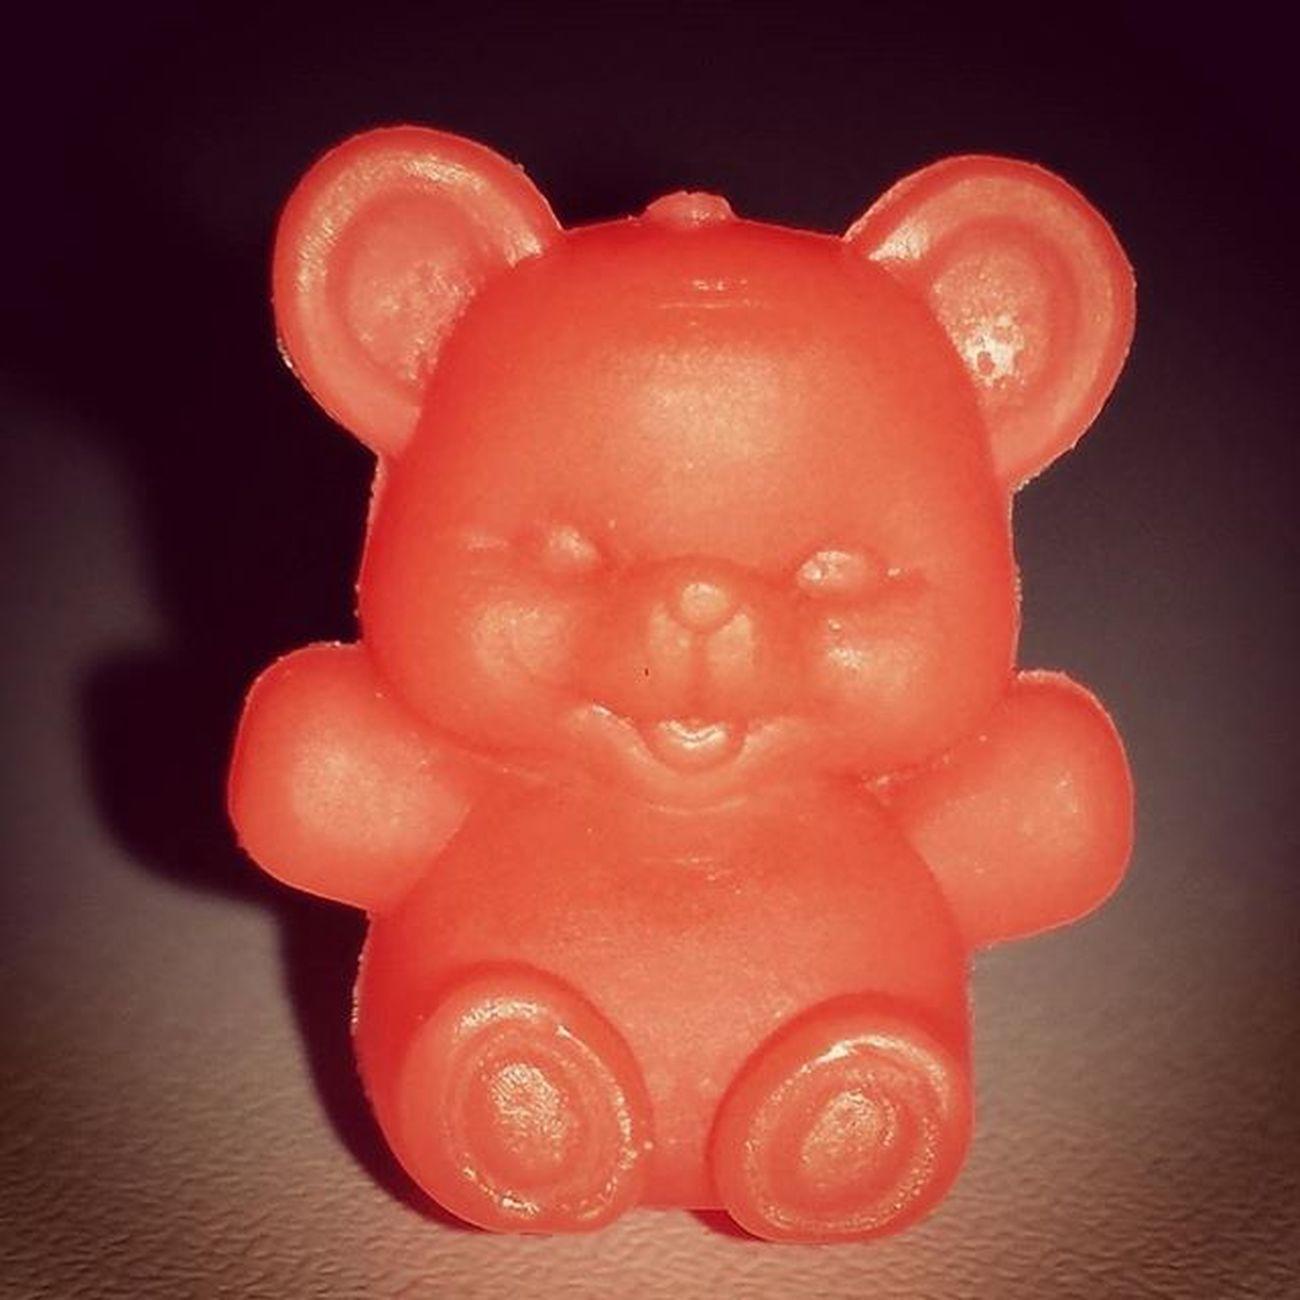 Bear Bad Plastic Plasticfigures 2016